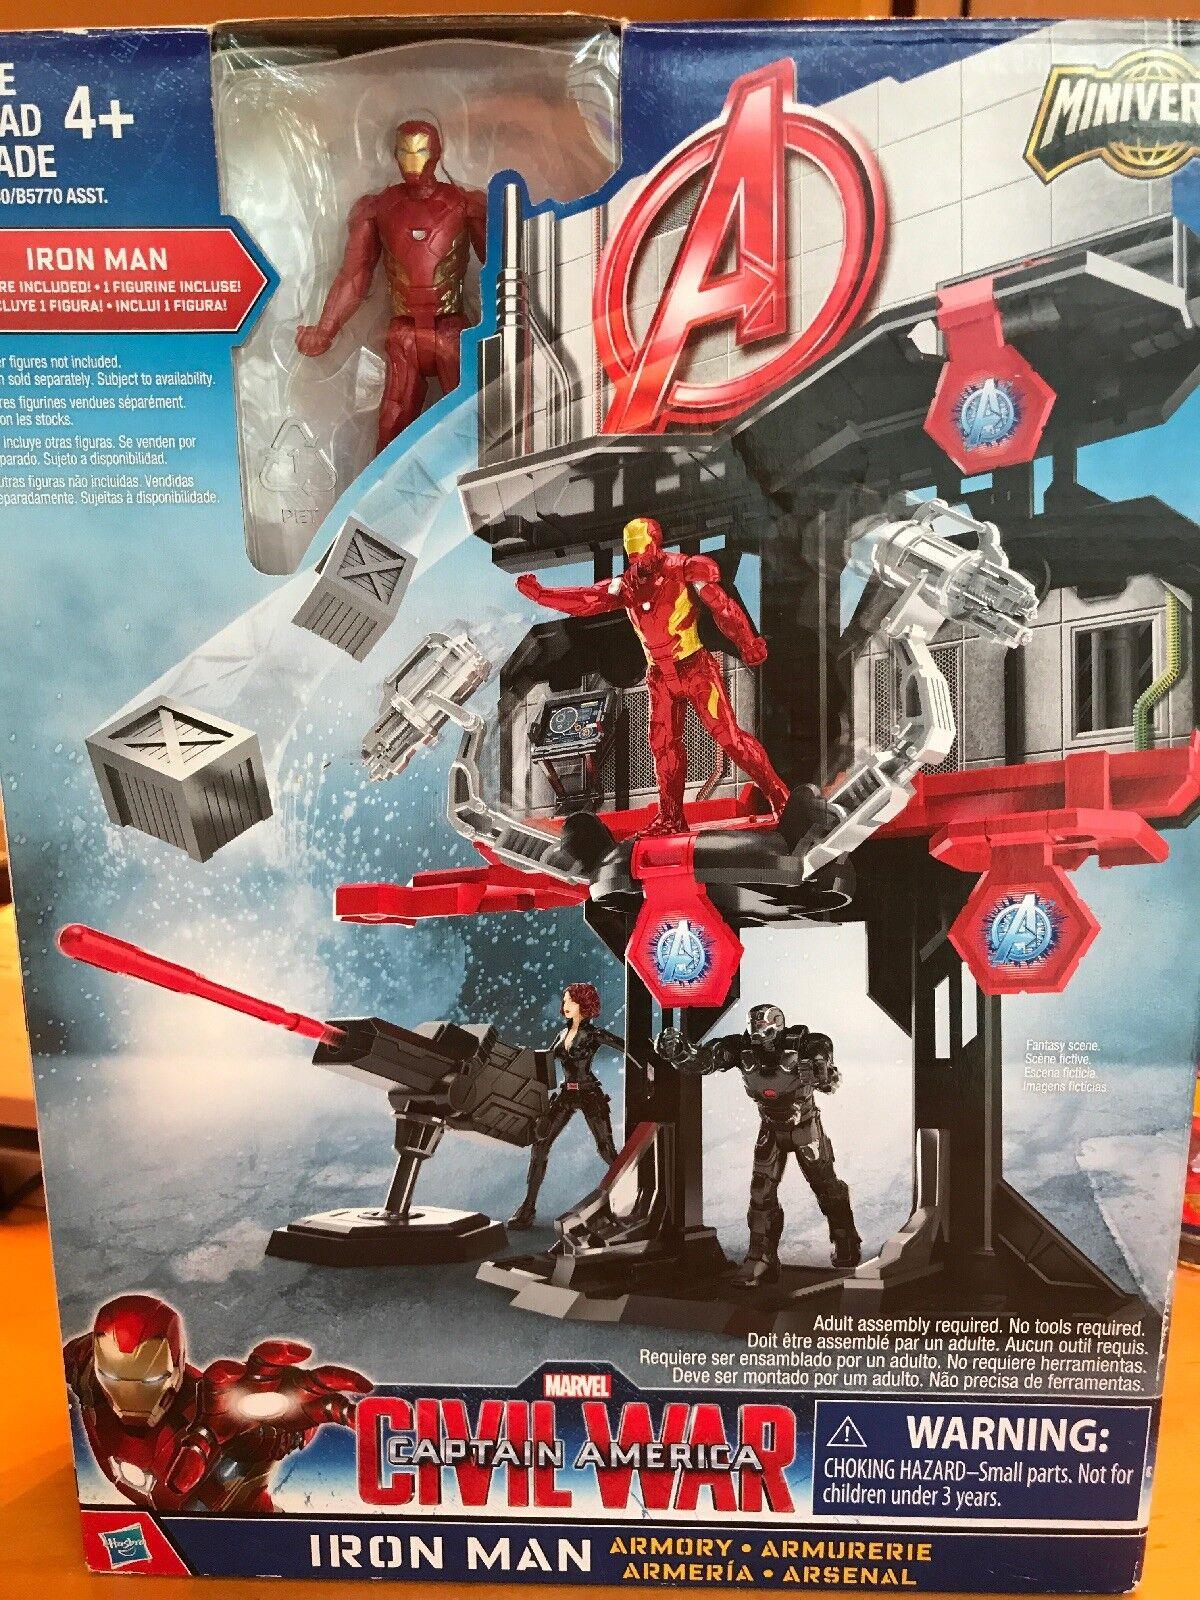 Marvel Iron Man Armory guerre civile Captain America miniverse Playset